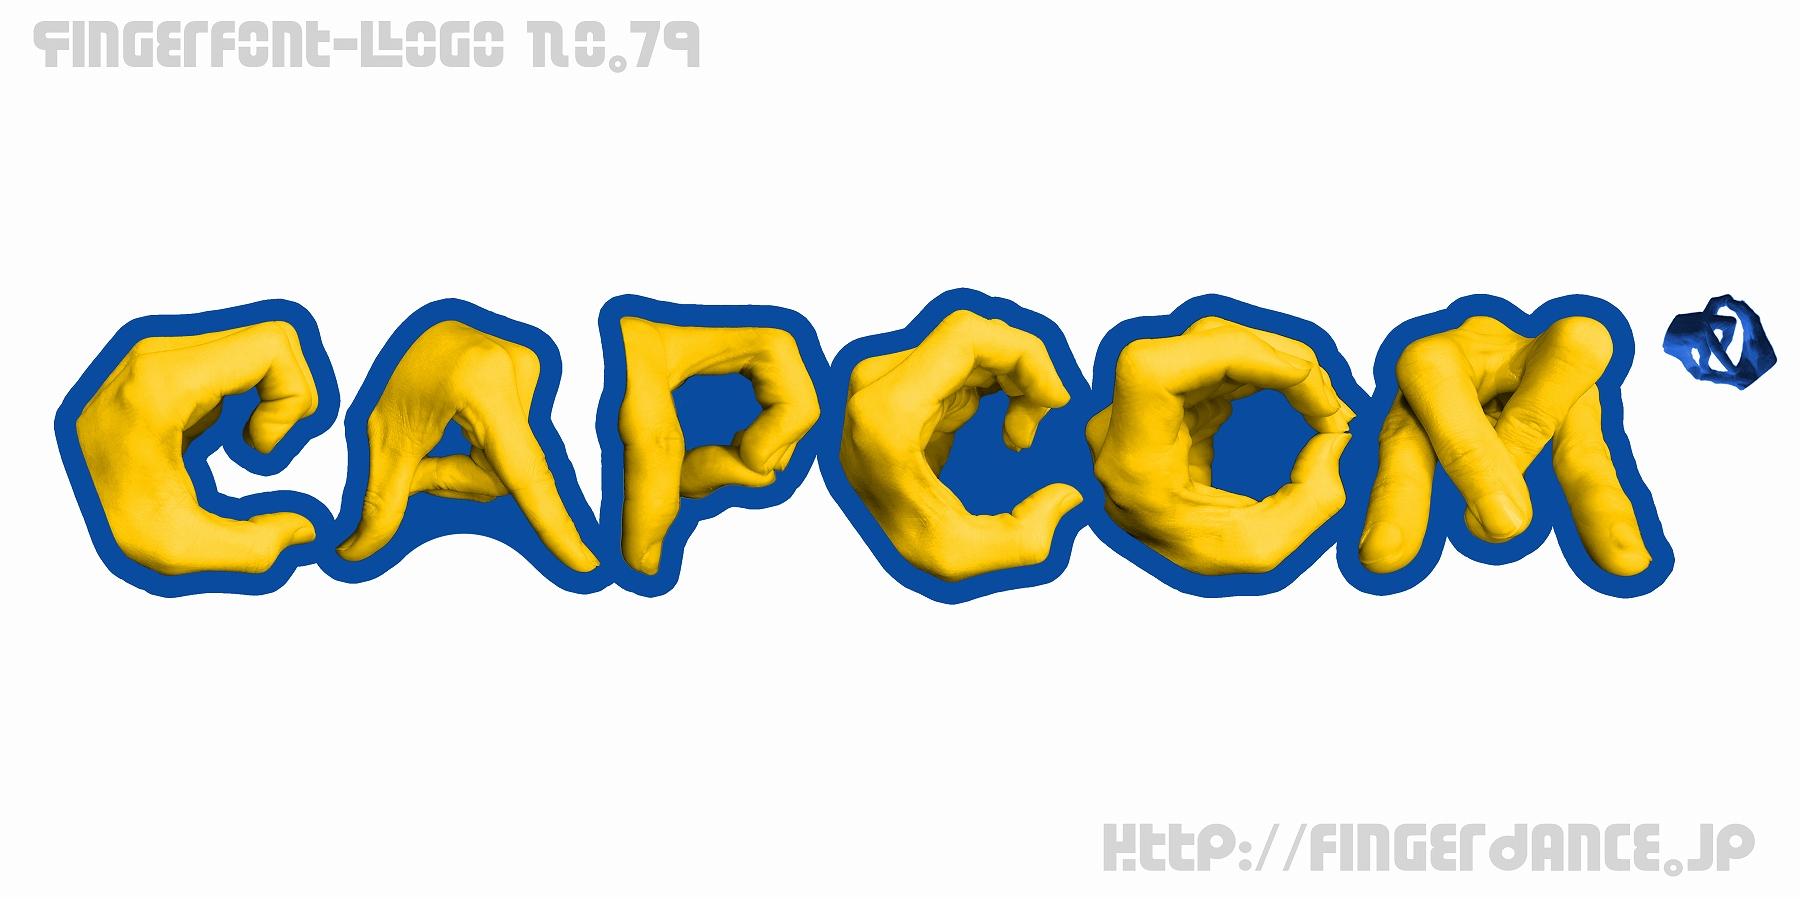 Capcom-fingerhttp://fingerdance.jp/L/logohand カプコン・フィンガーロゴハンド手指